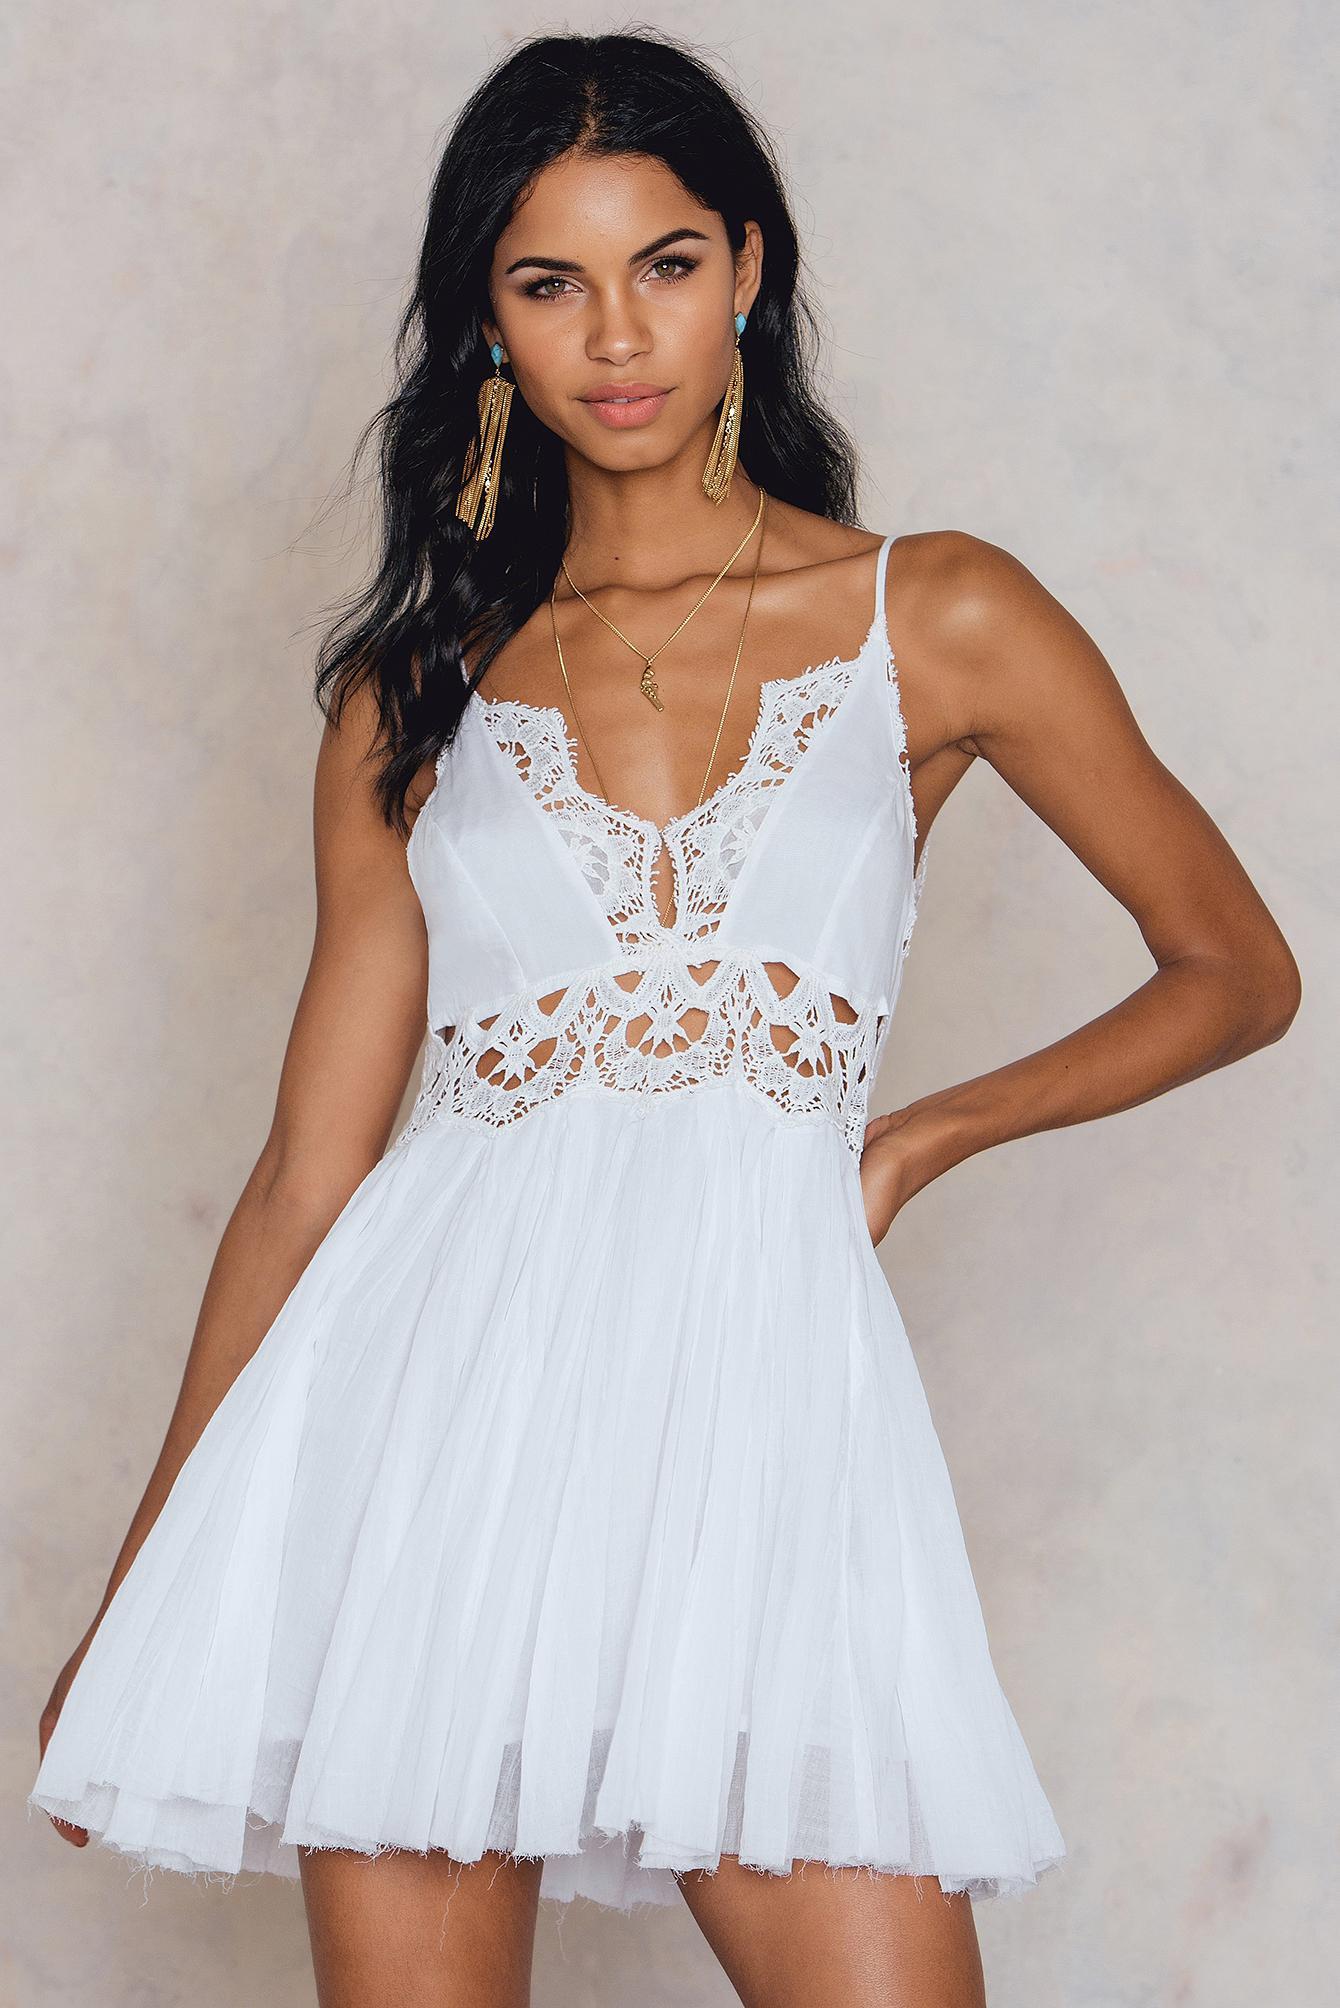 dc31e425a40c Free People Ilektra Mini Dress in White - Lyst